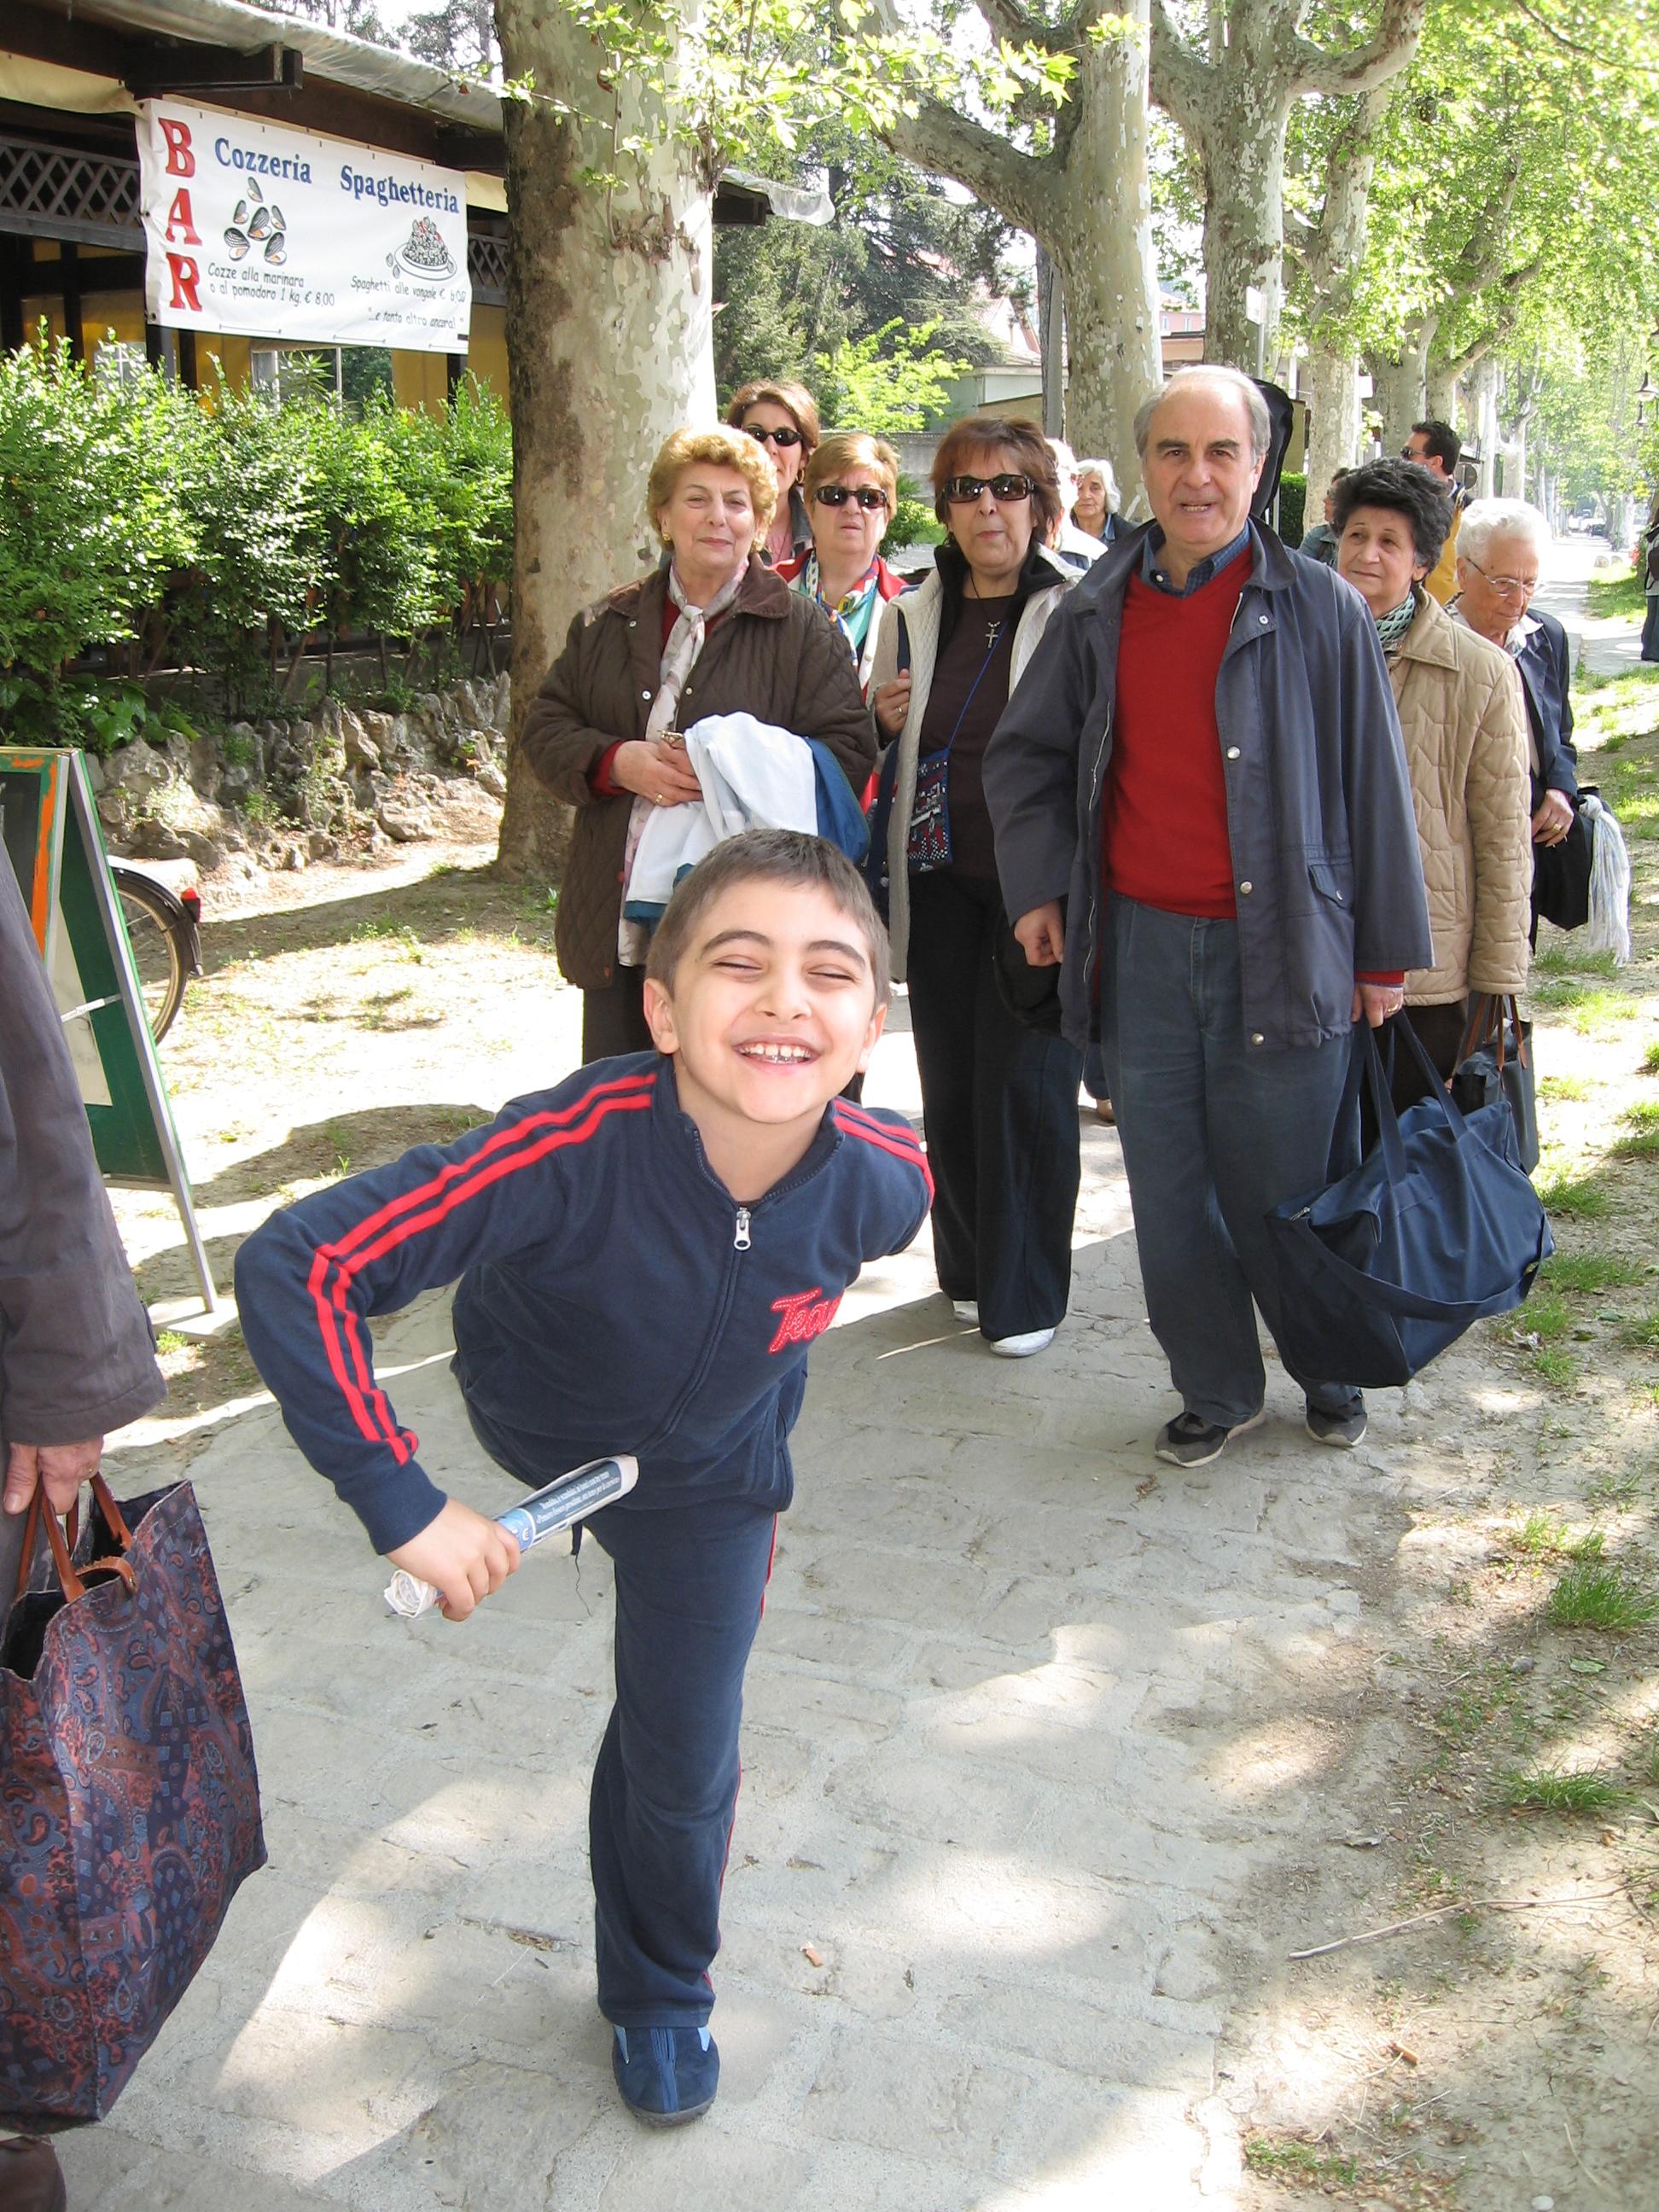 Lagaccio_Acqui_Terme-2008-05-01--09.35.22.jpg